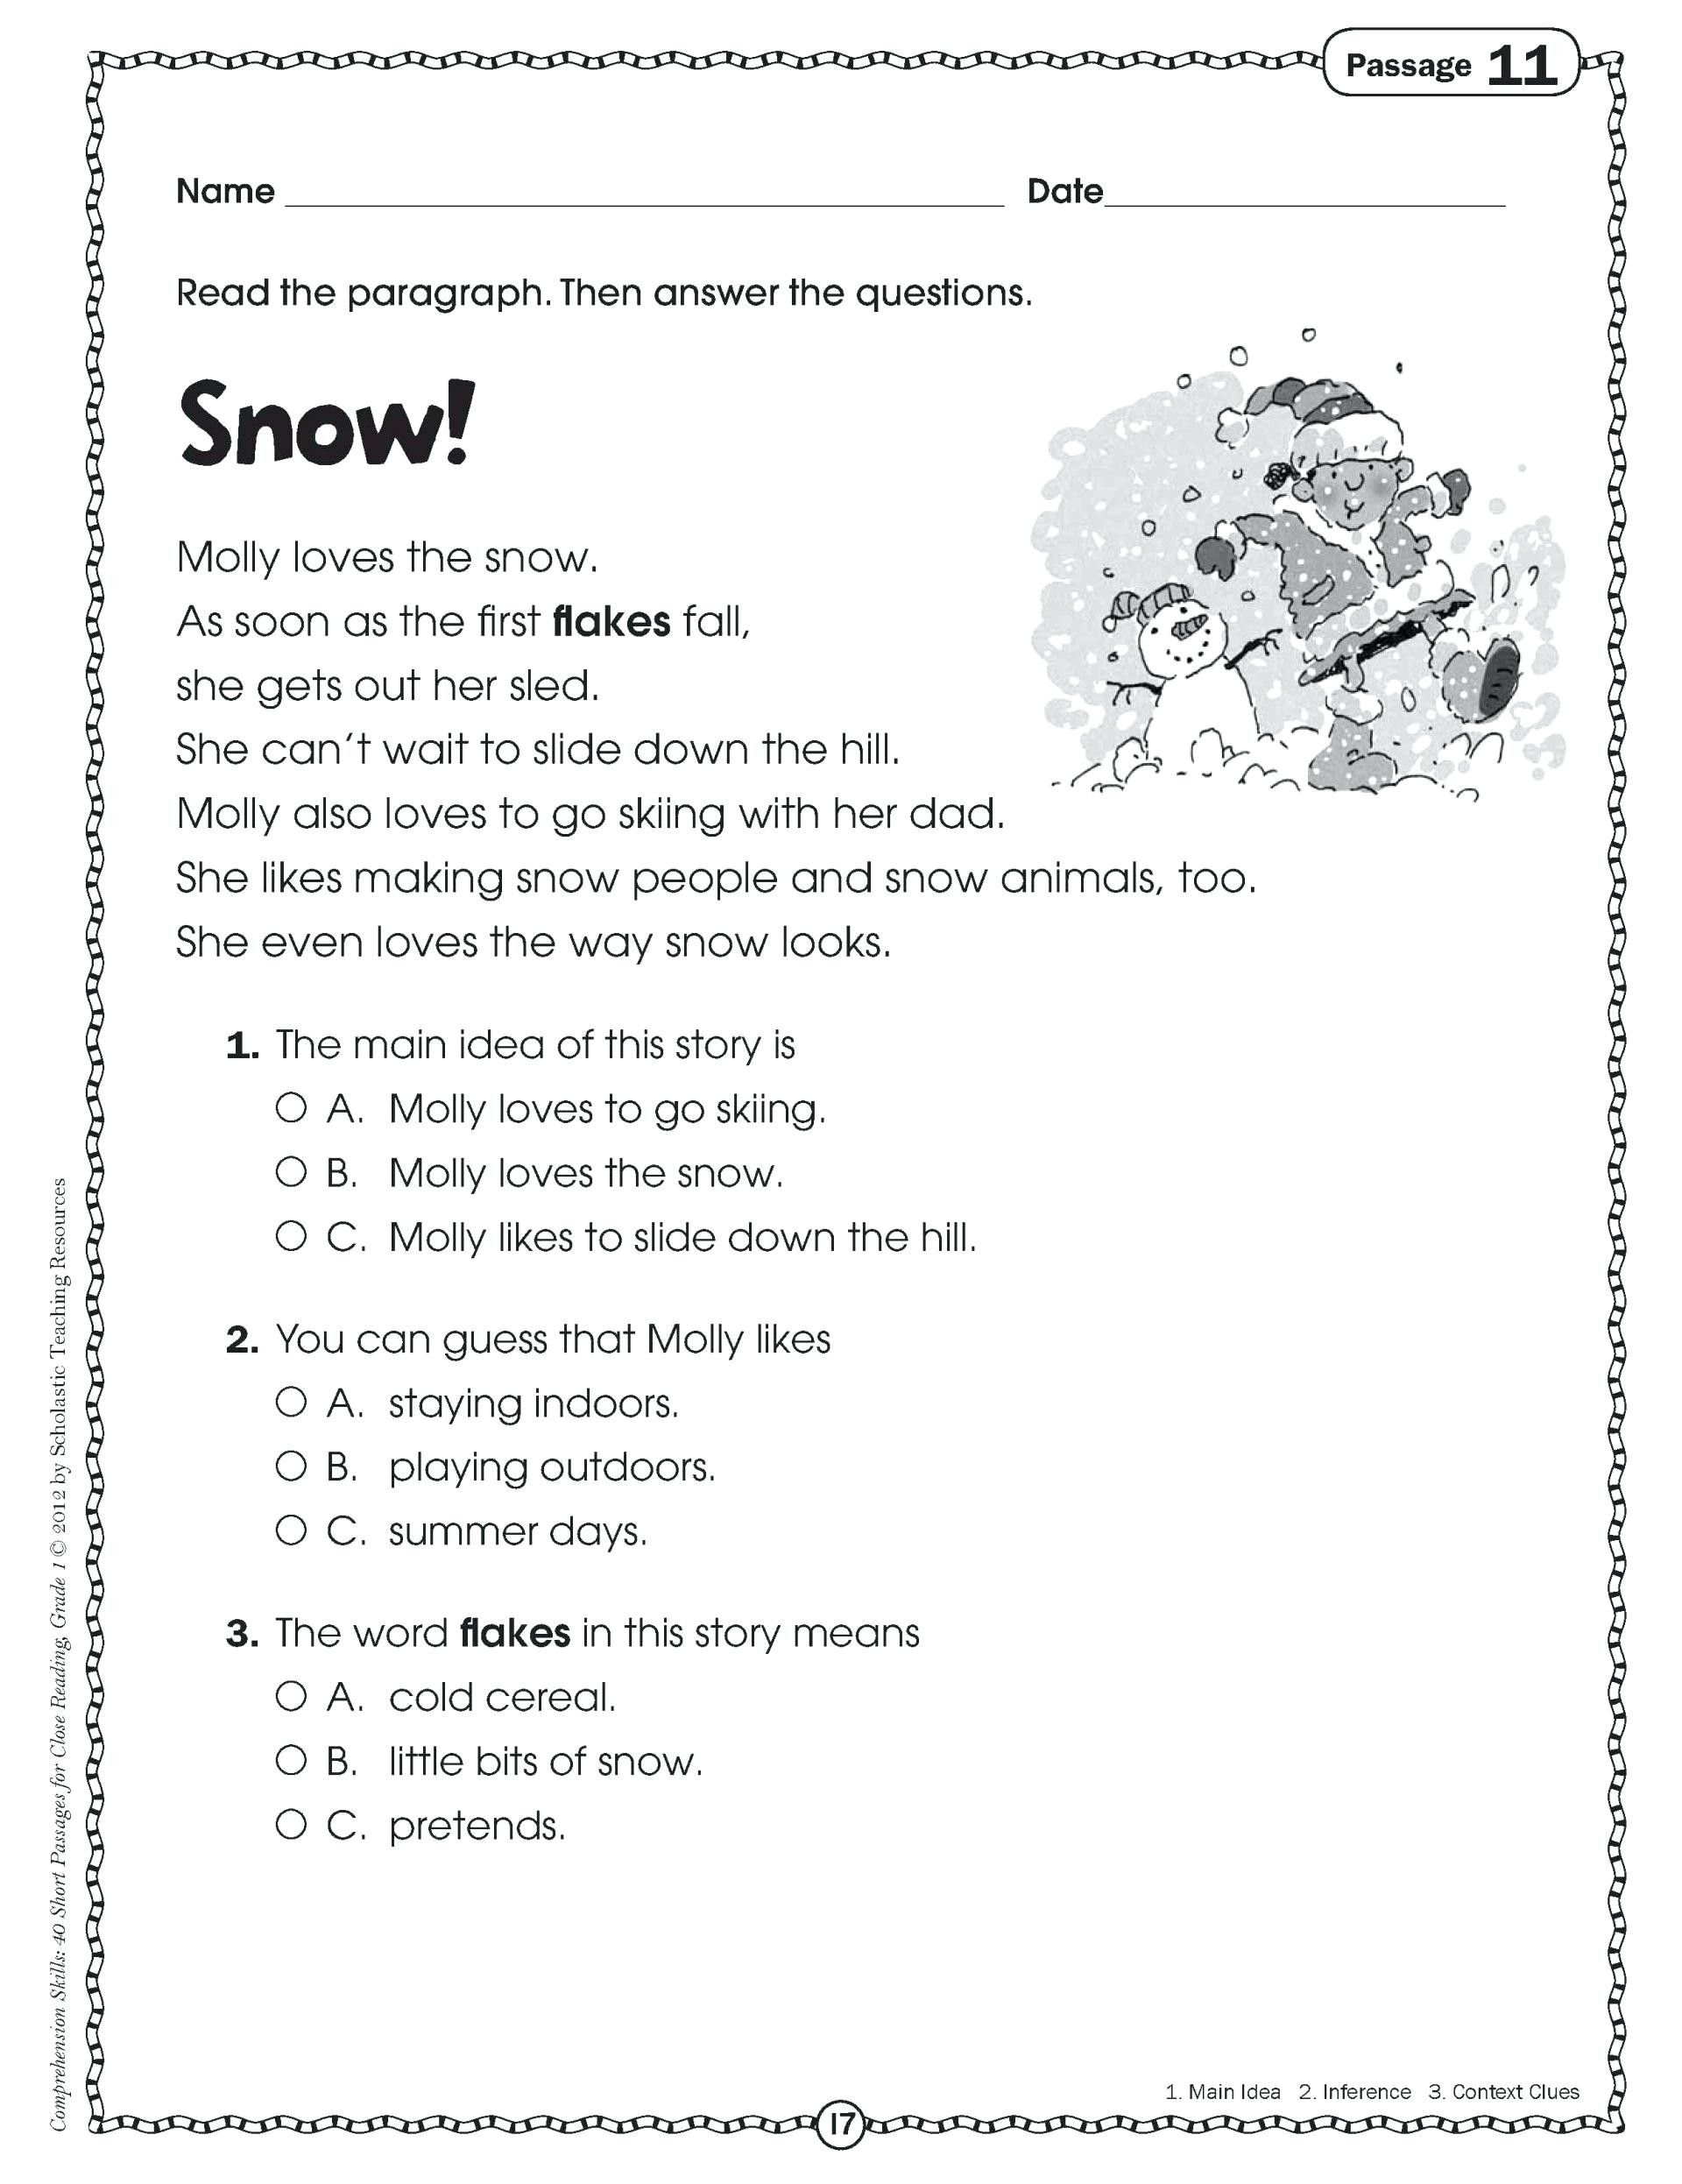 5 Printable Phonics Worksheets Reading Comprehension Coloring Book First Grade Readingksheets In 2020 Comprehension Worksheets Reading Worksheets Main Idea Worksheet